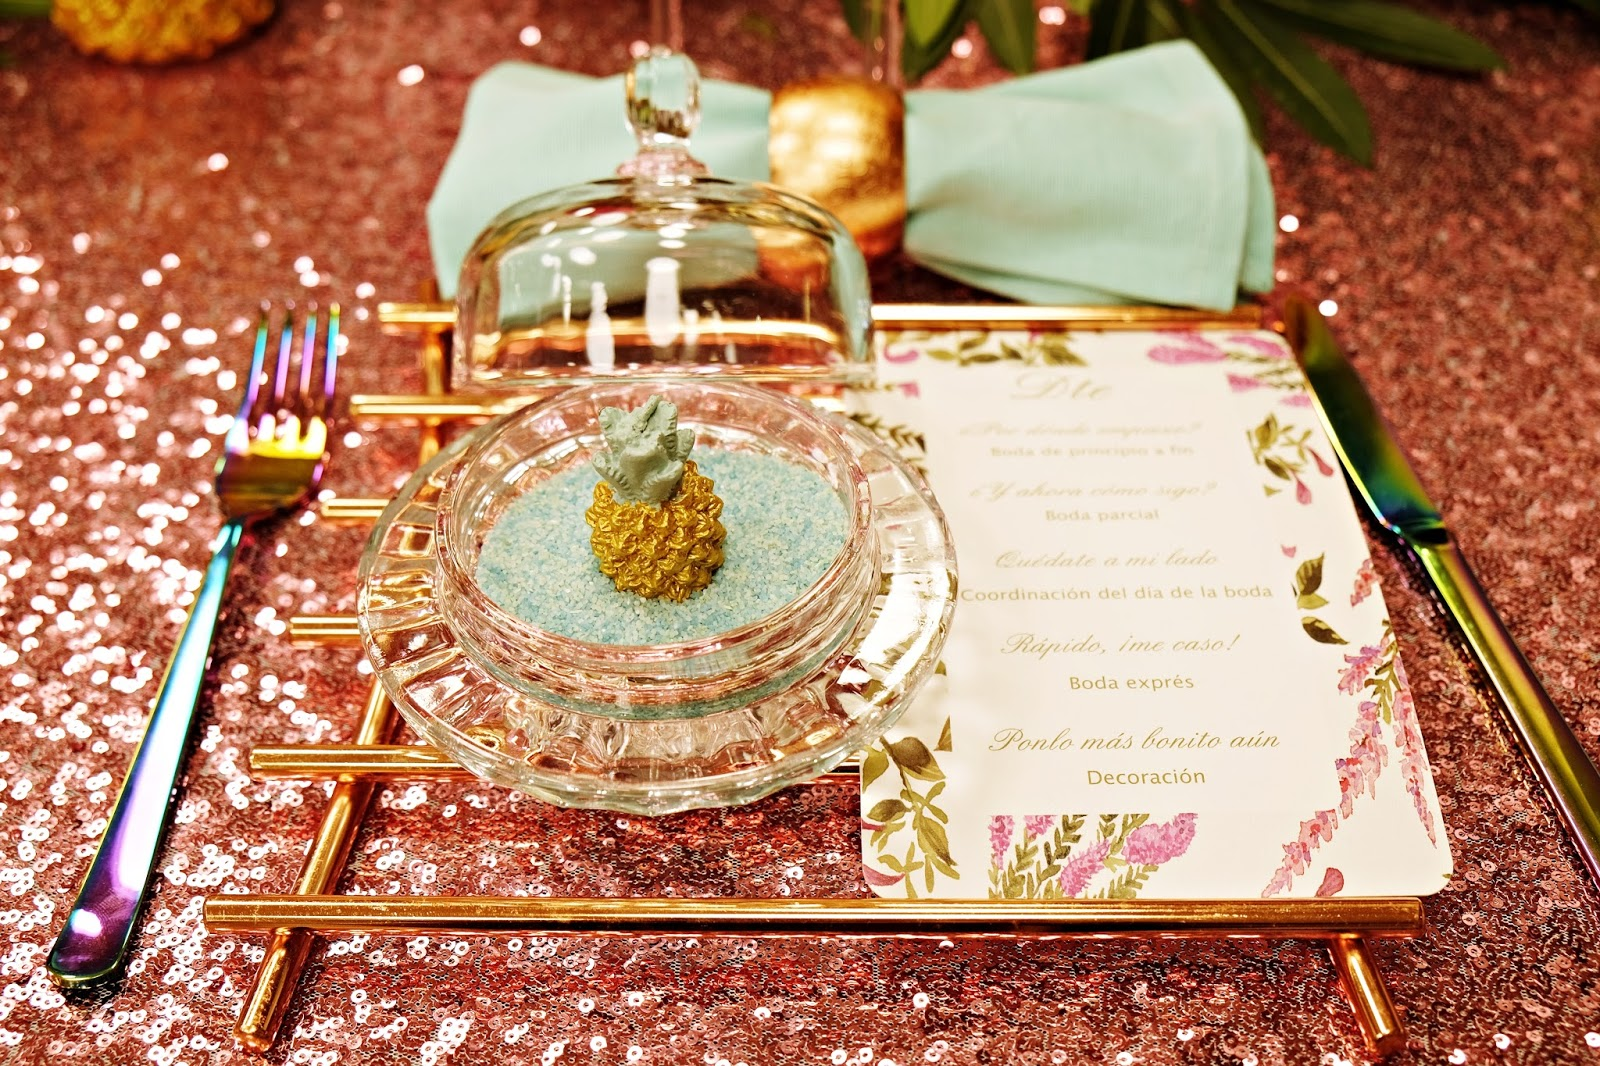 Blog mi boda ganadores mi boda rocks experience madrid 2017 - Donde celebrar mi boda en madrid ...